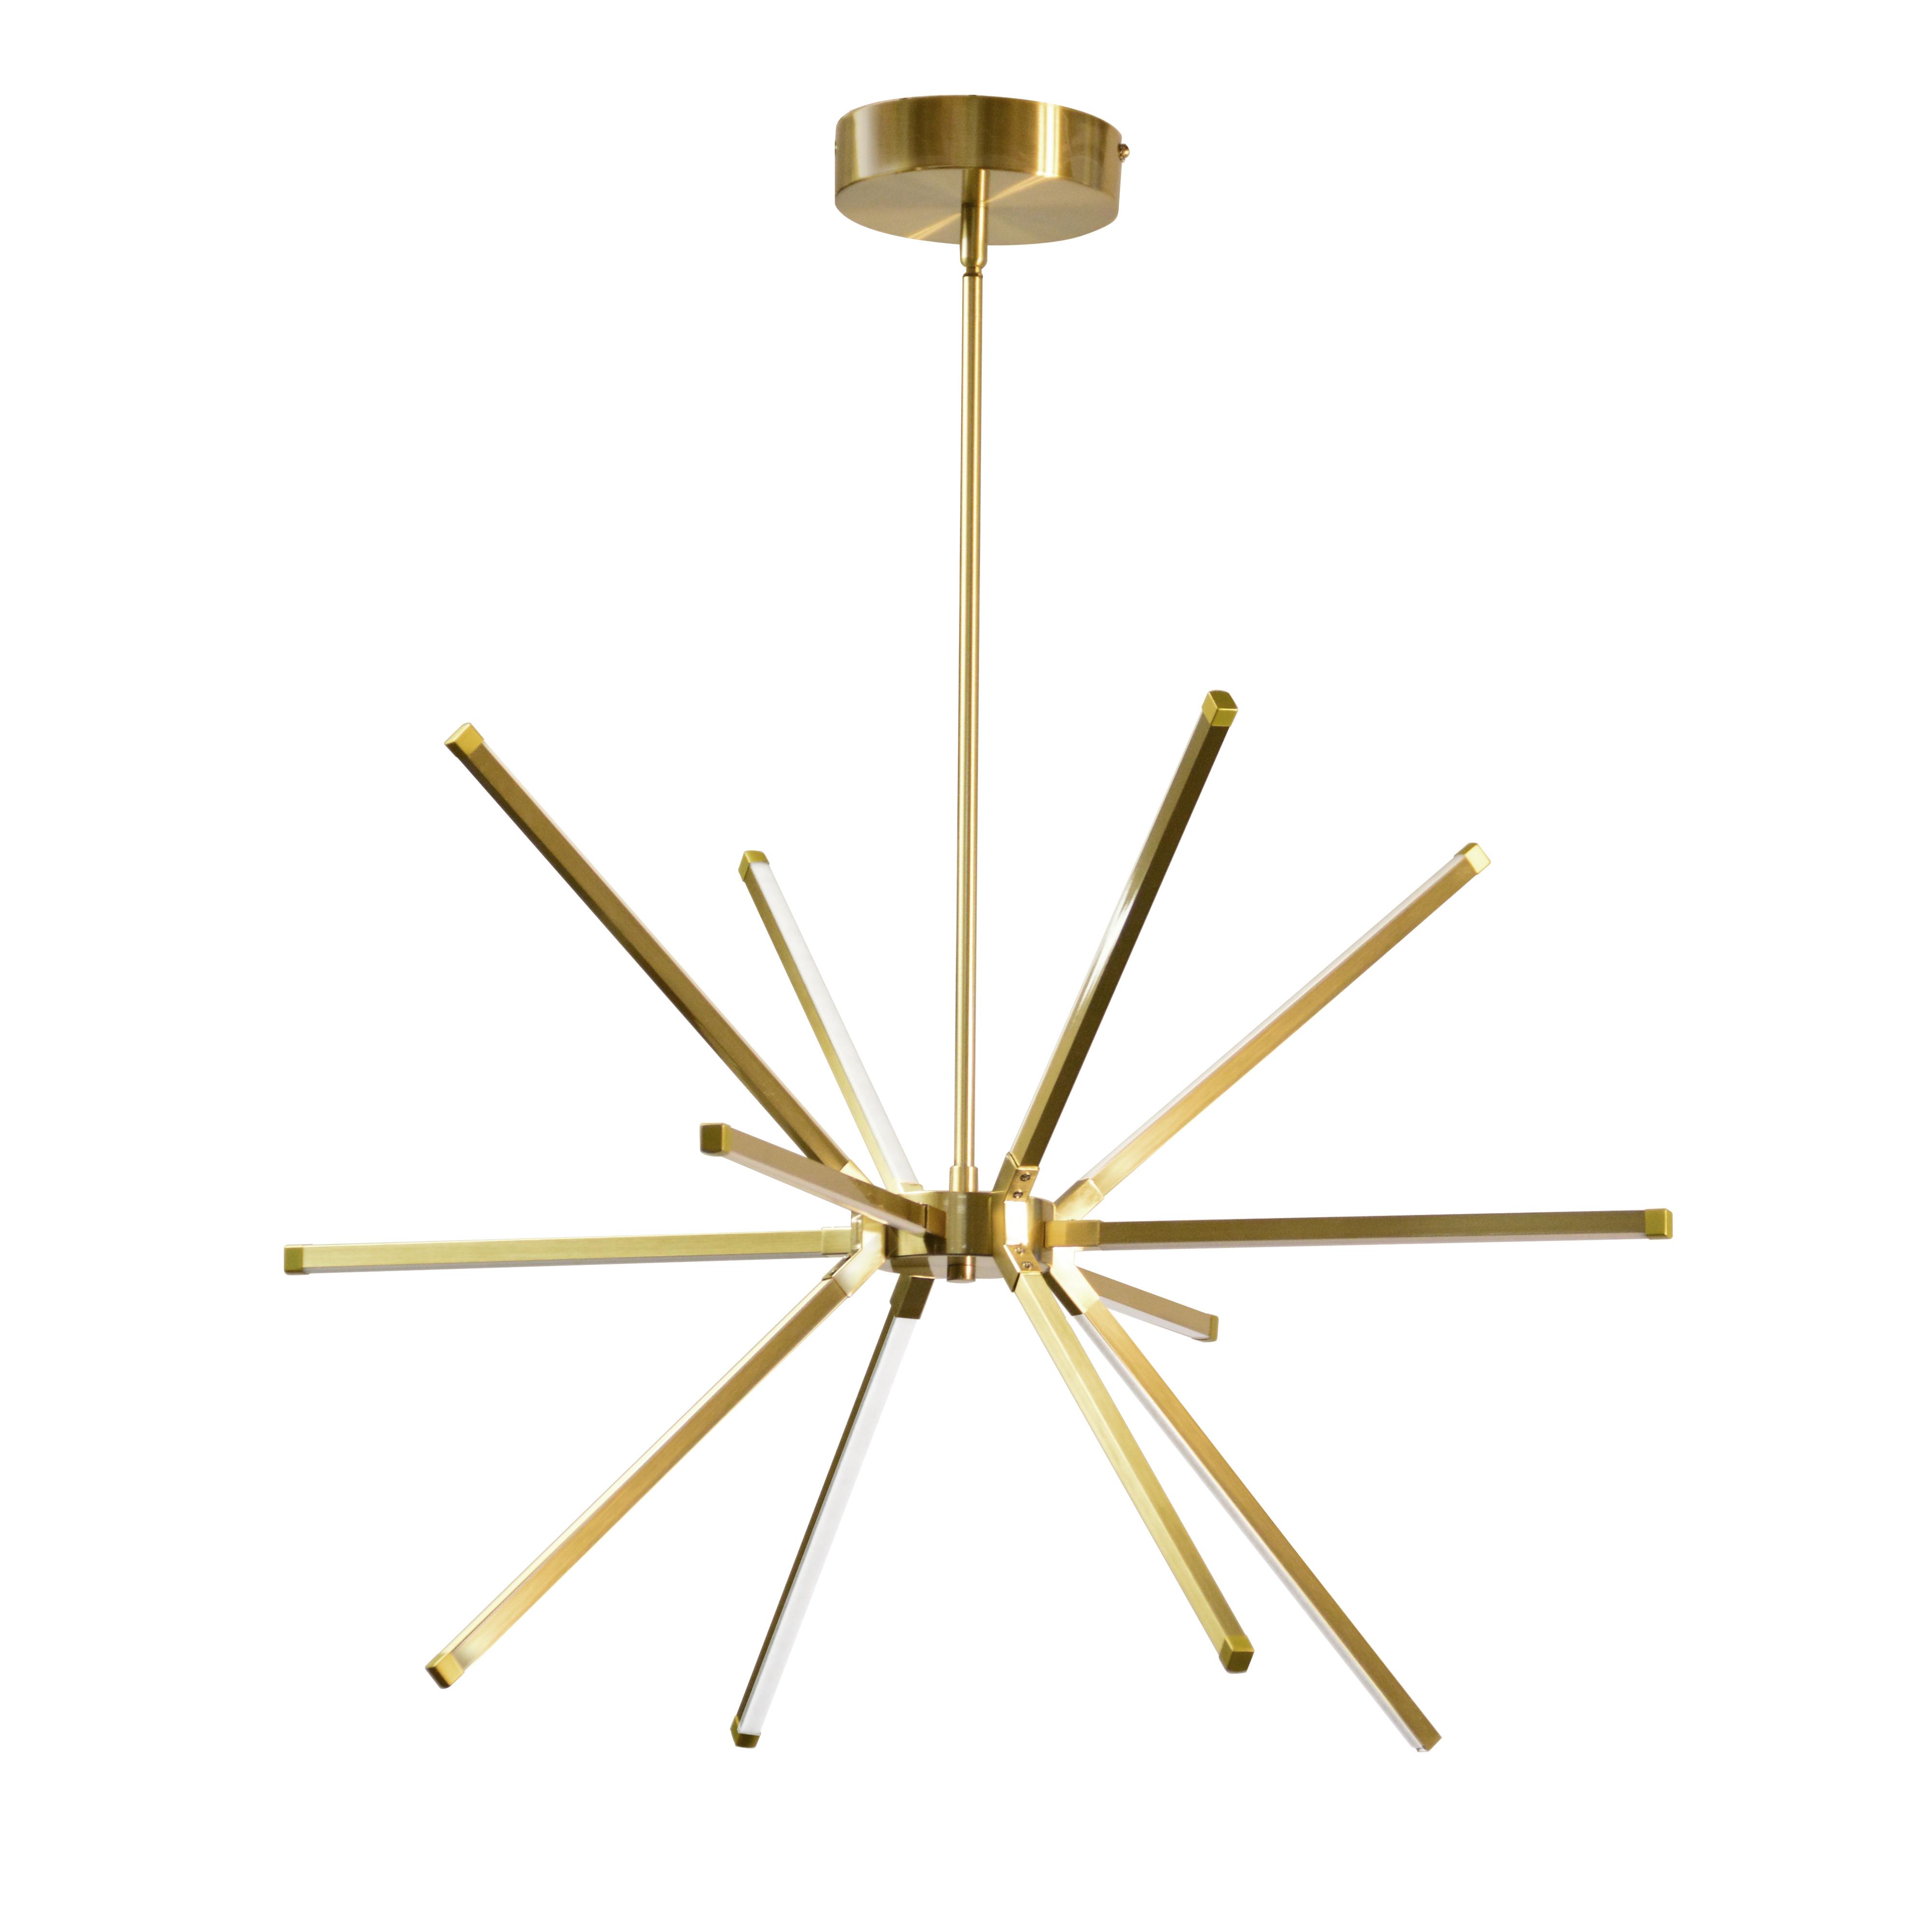 32 Watt LED Chandelier Aged Brass w/ White Acrylic Diffuser